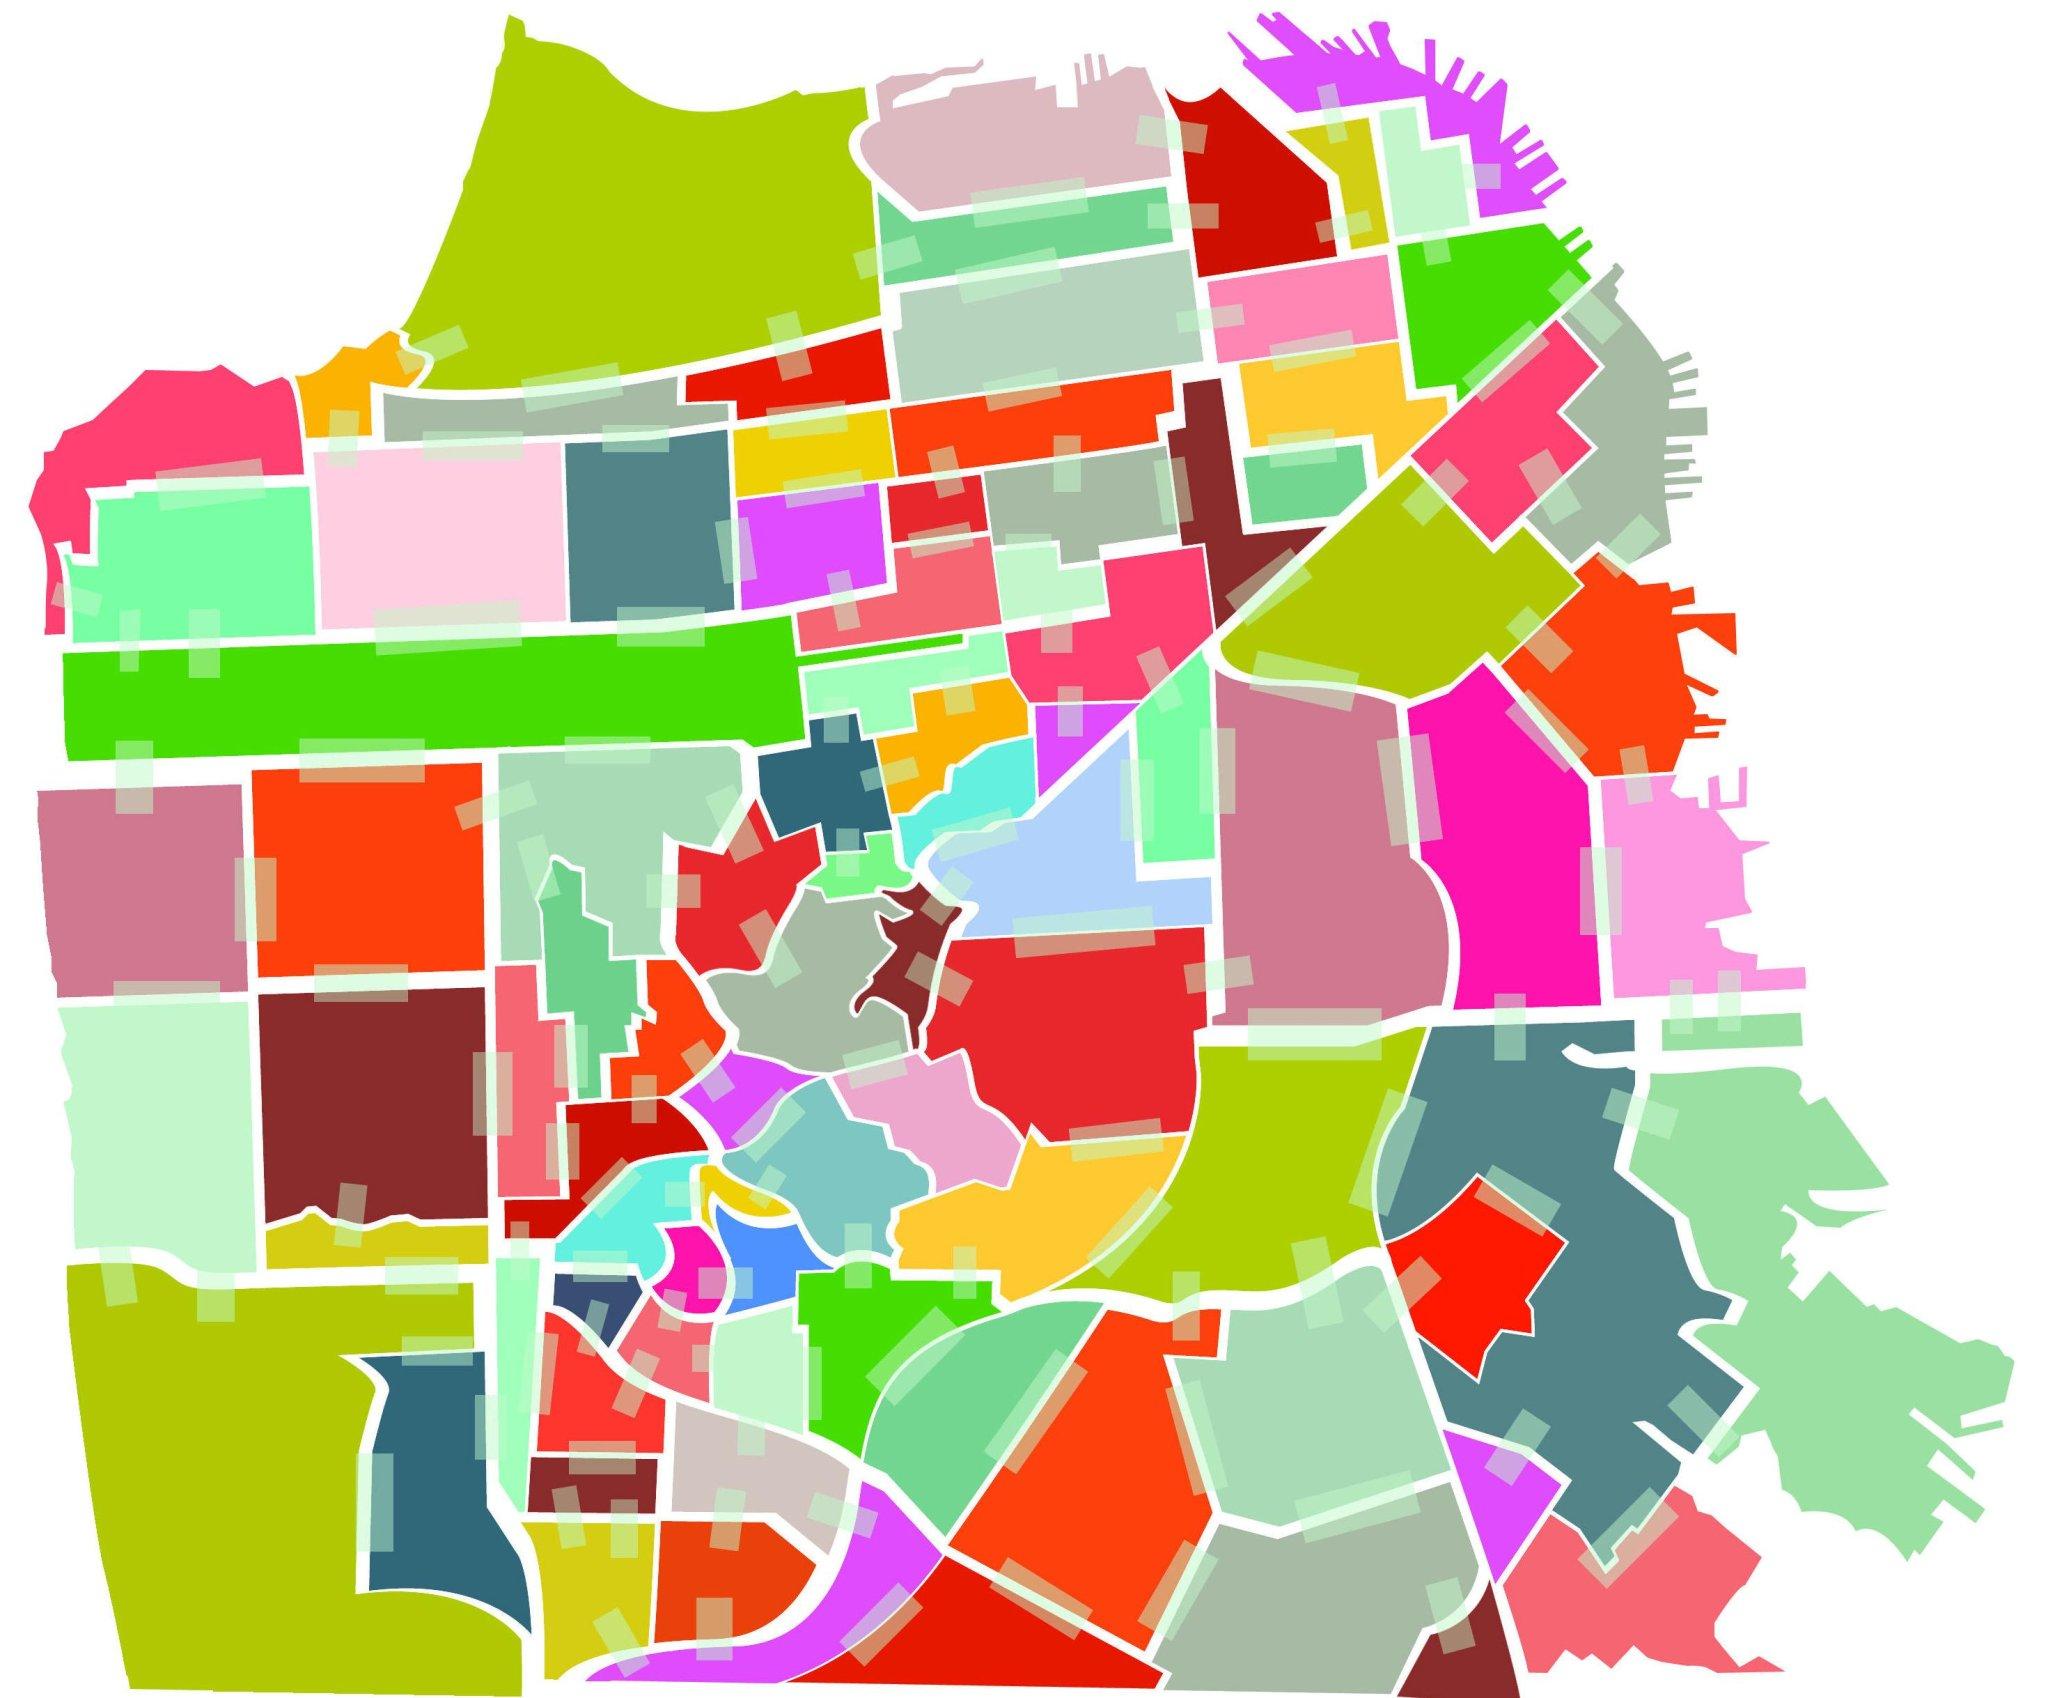 Marina clipart neighborhoods #9